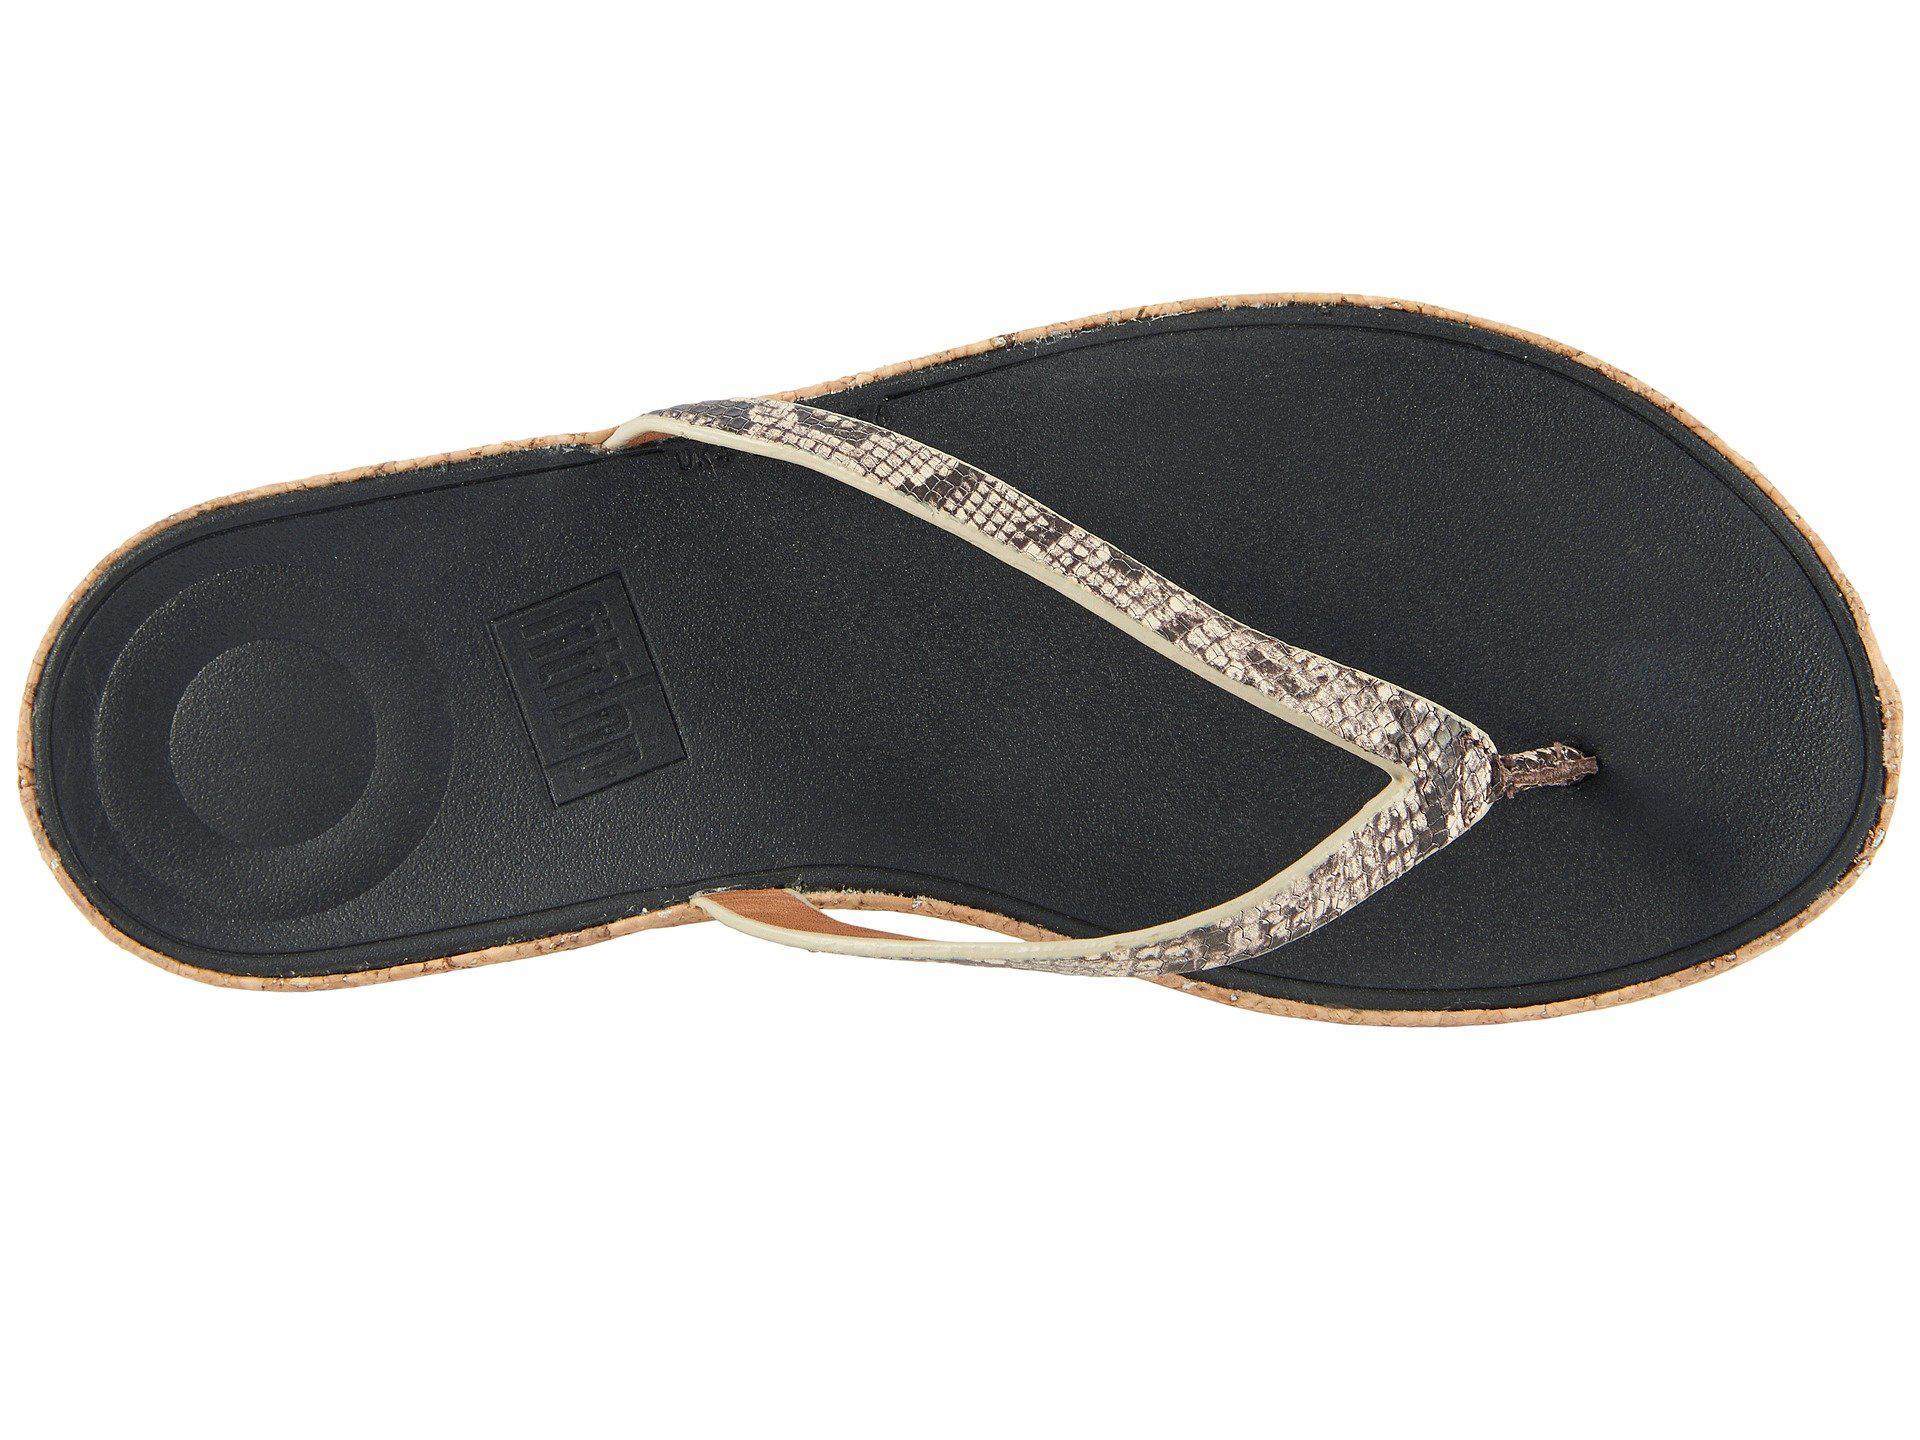 427f410694b7b3 Fitflop - Multicolor Linny Toe Thong Sandals - Lyst. View fullscreen